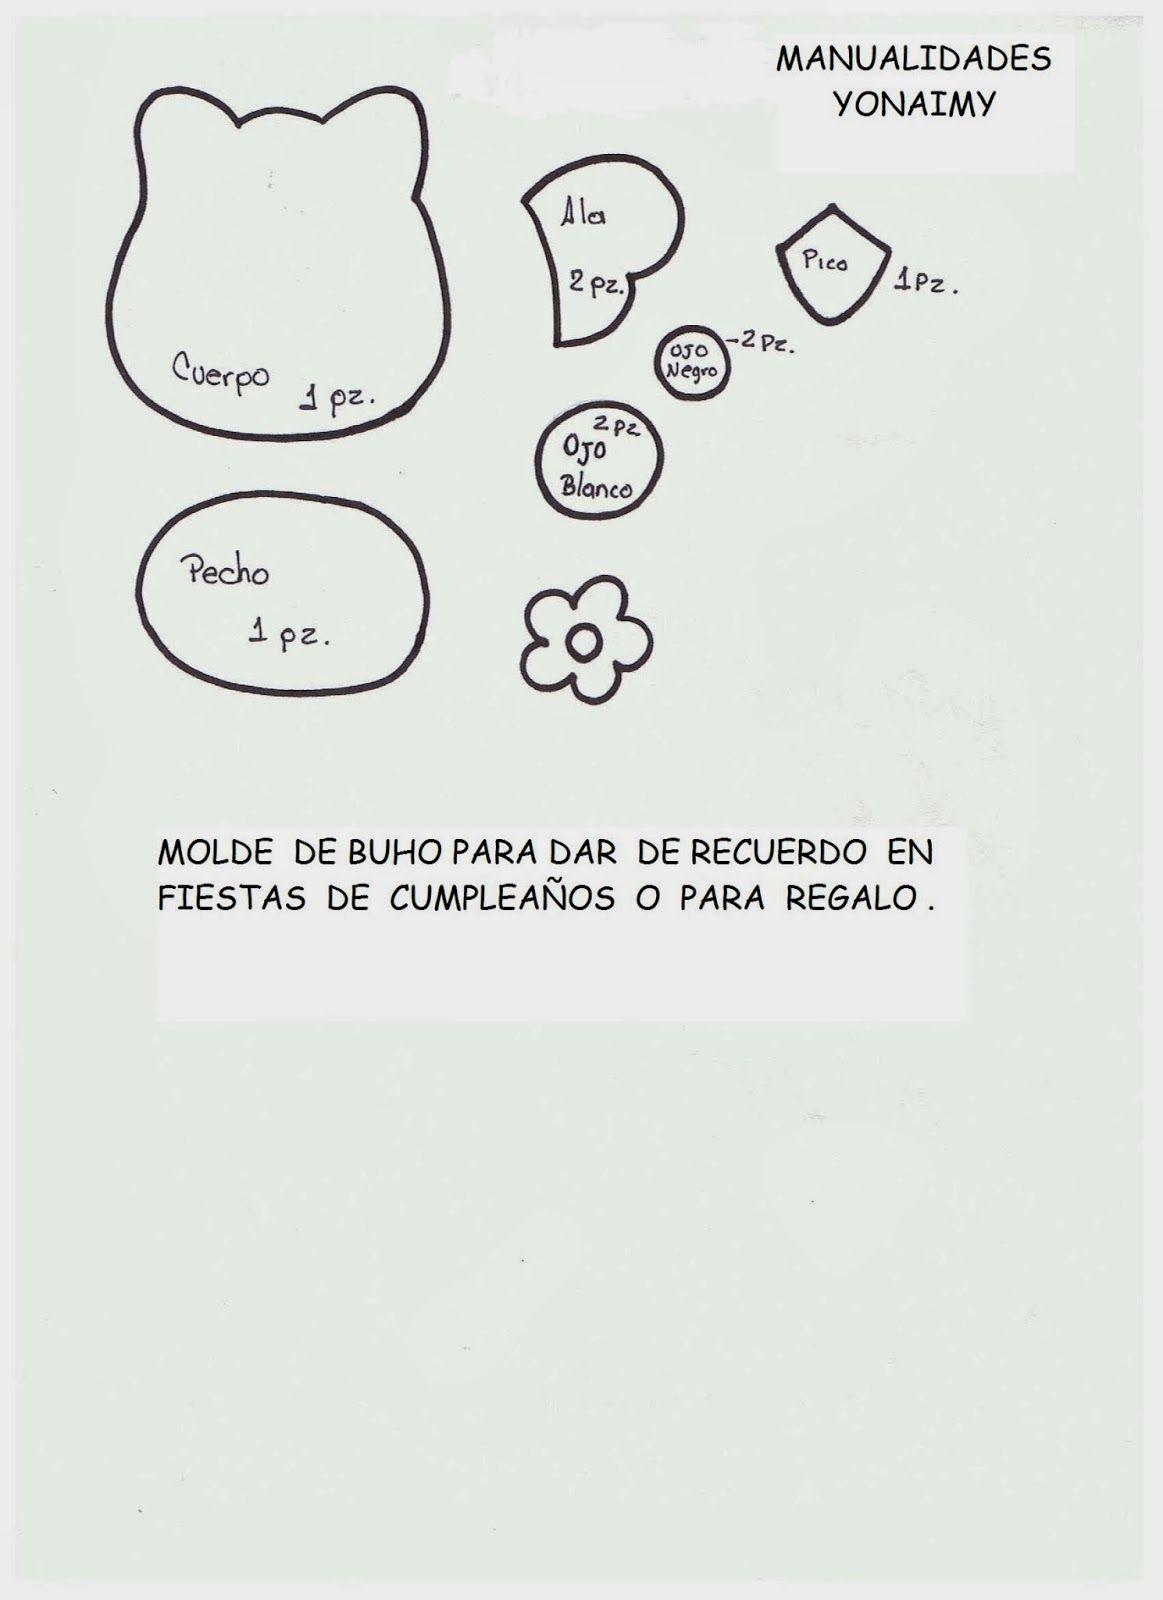 MANUALIDADES YONAIMY | Manualidades yonaimy, Buhos, Moldes de buhos